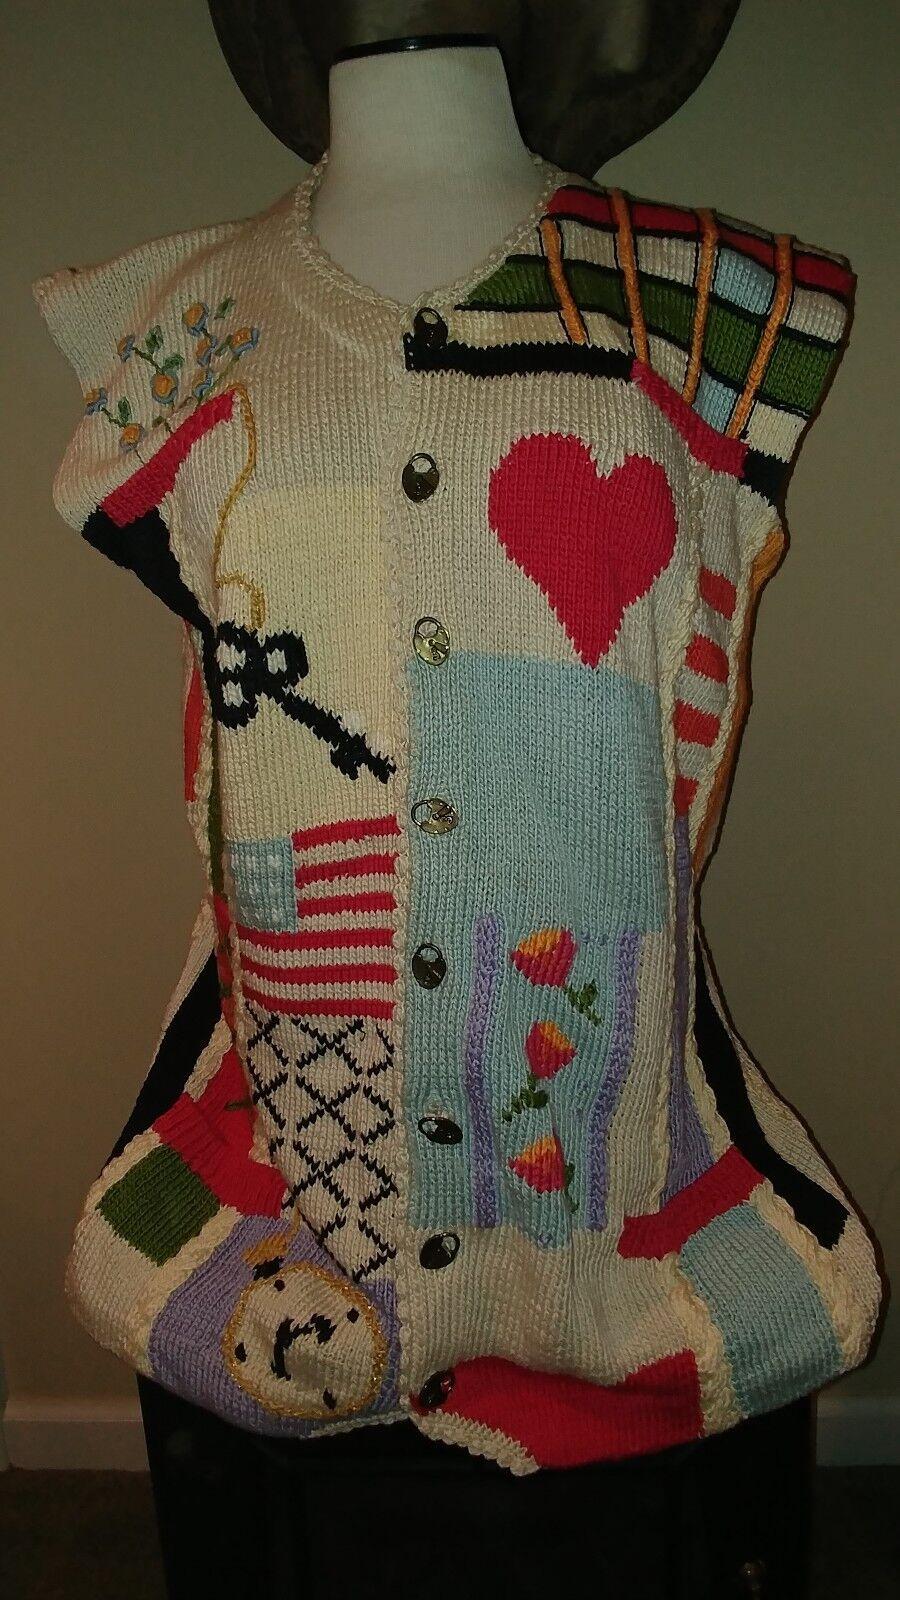 Outstanding Berek Marta D Vintage 1992 Handknit Cotton Cardigan Size M Hearts